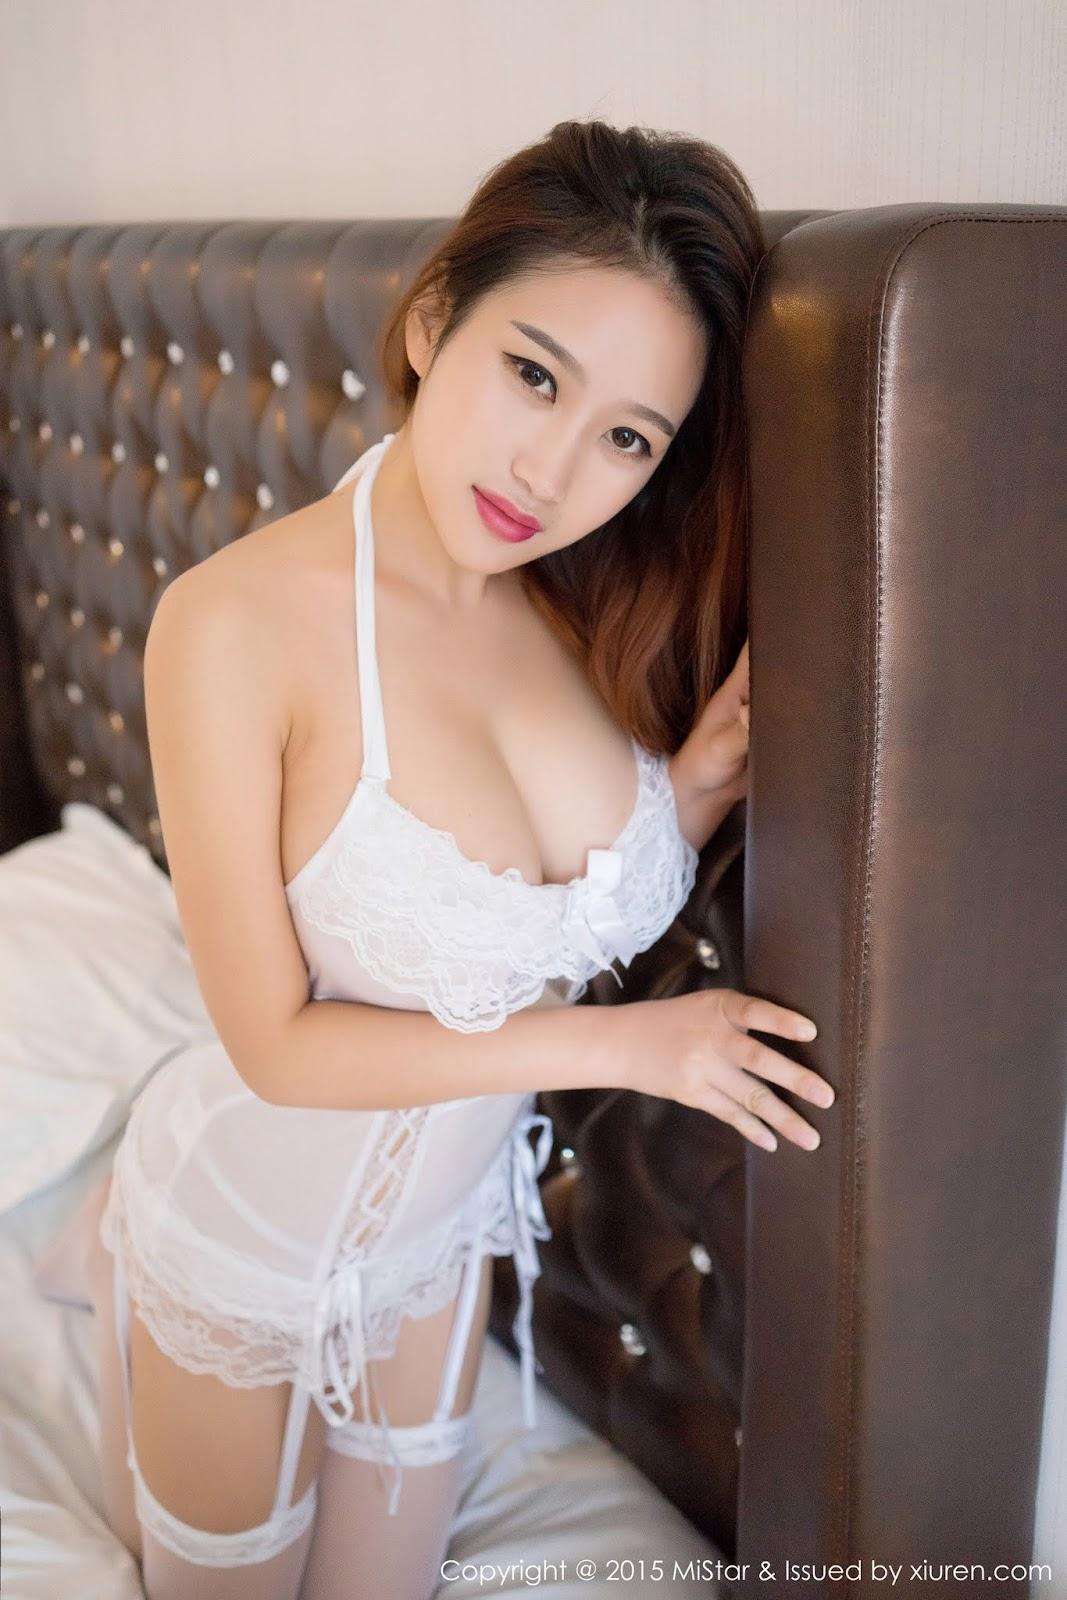 0004 - Xiuren Mistar Nude Naked